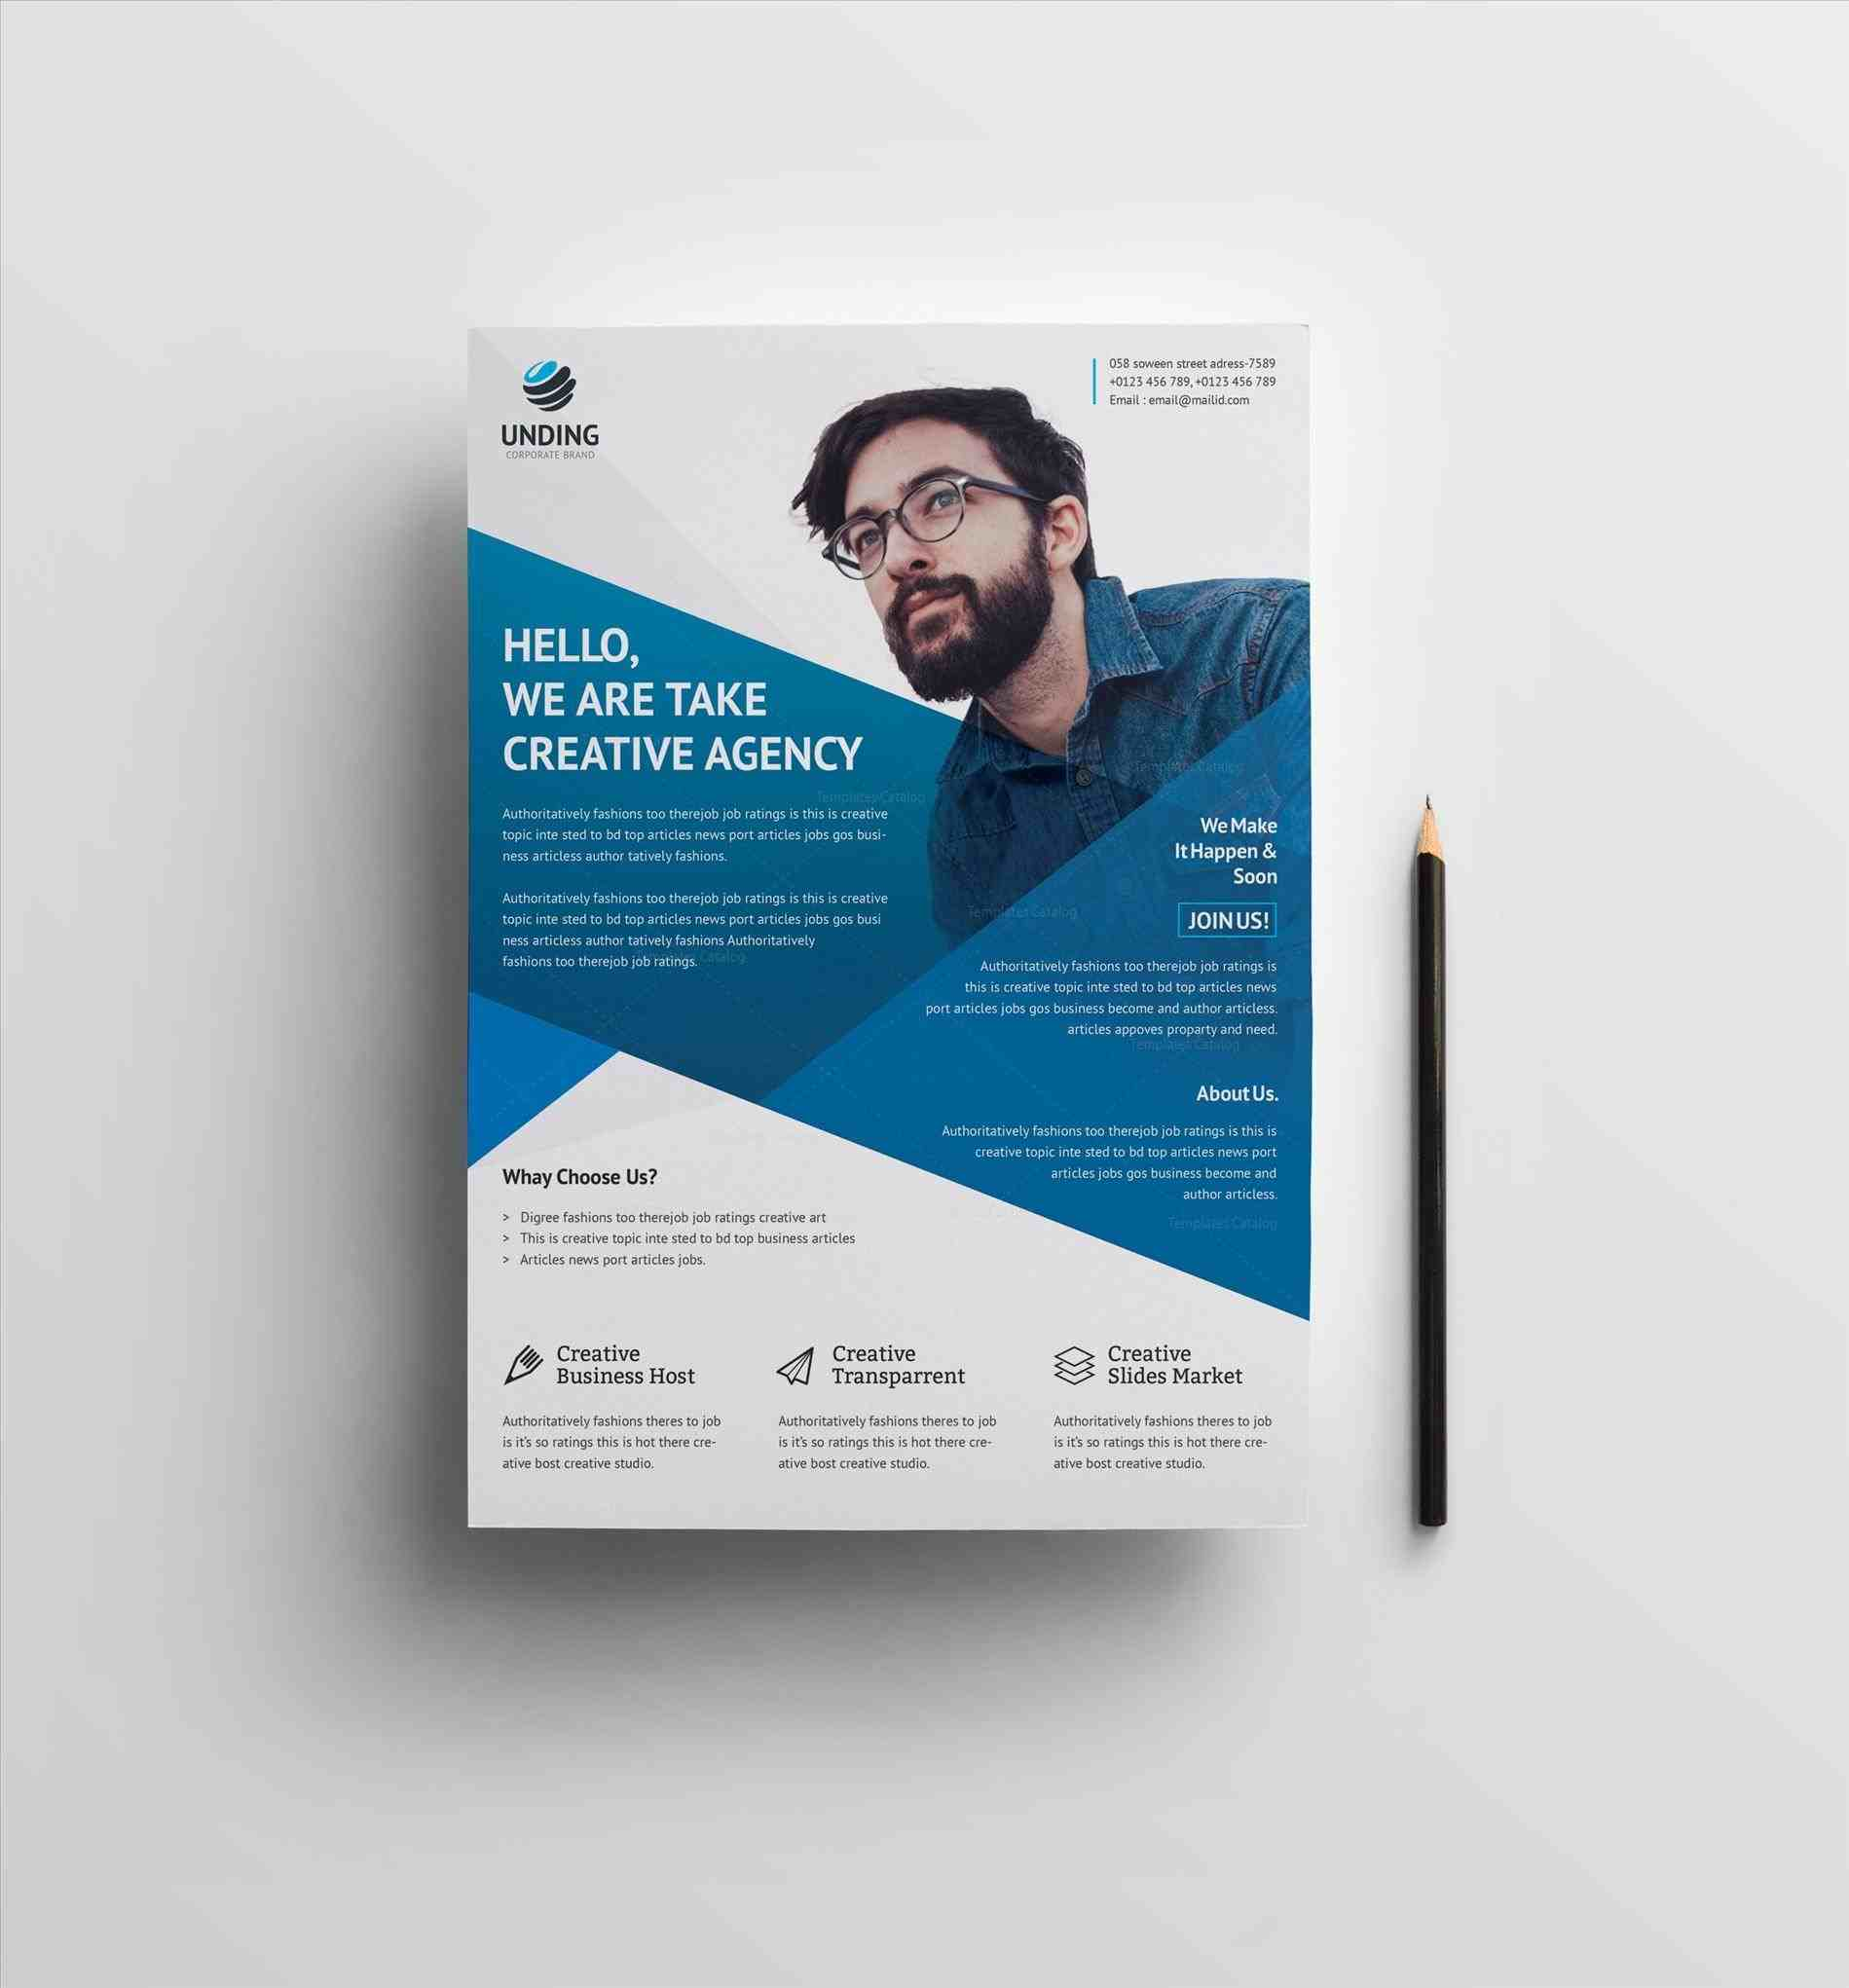 premium business flyer template rhtemplatescatalogcom with color schemes by kinzi graphicriverrhgraphicrivernet business Business Flyer Template flyer template with color schemes